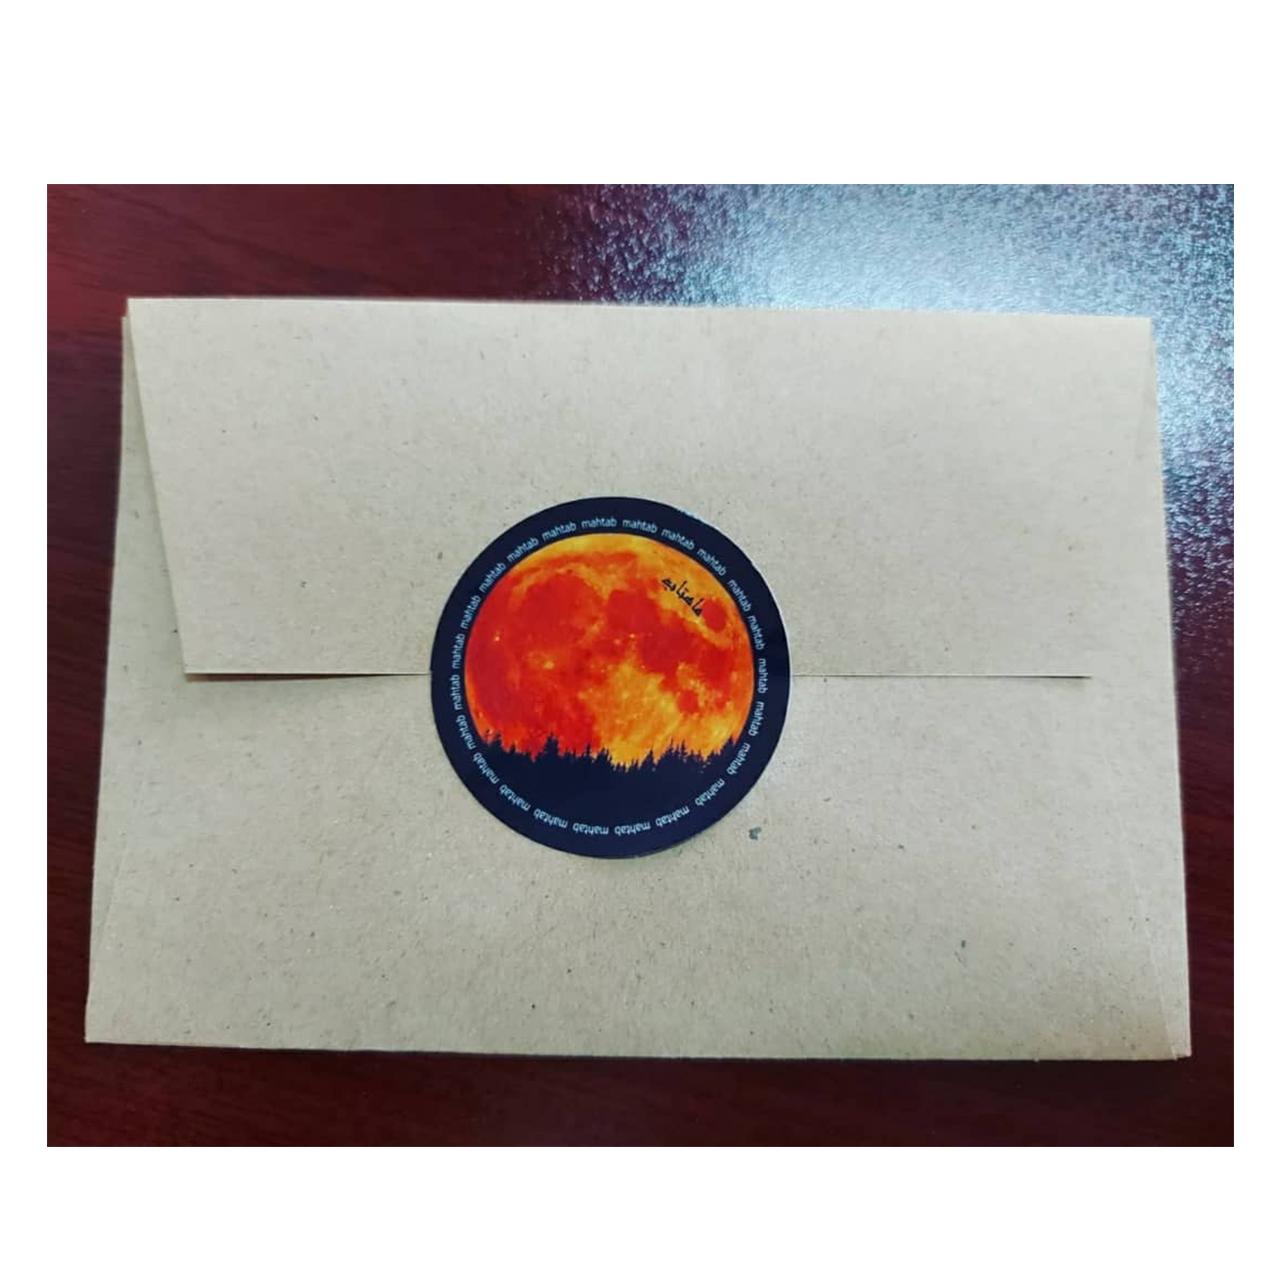 کارت پستال ماهتاب طرح عاشقتم عشق دوست دارم کد 1898